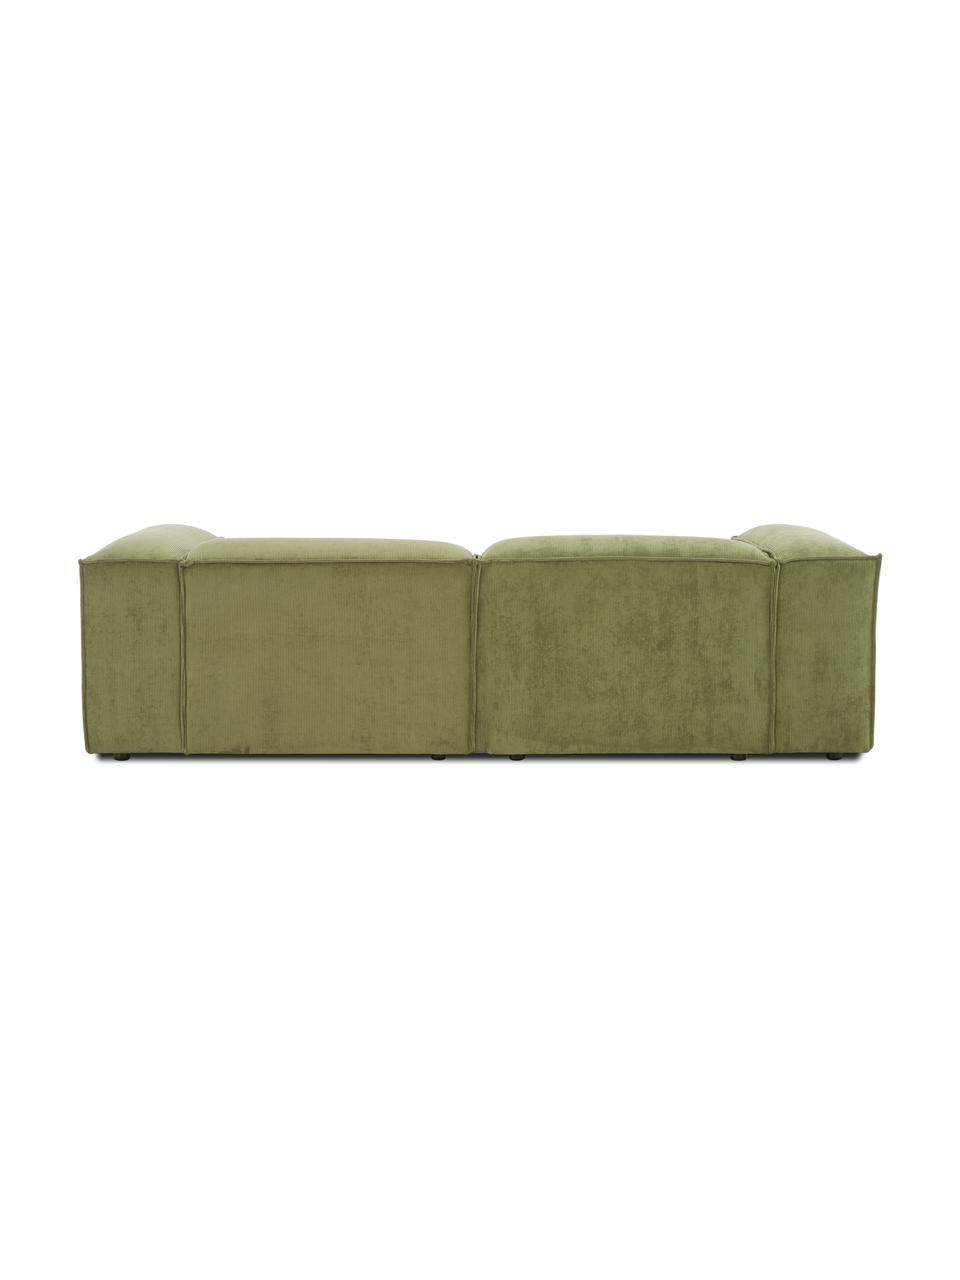 Modulares Ecksofa Lennon in Grün aus Cord, Bezug: Cord (92% Polyester, 8% P, Gestell: Massives Kiefernholz, Spe, Füße: Kunststoff Die Füße befin, Cord Grün, B 238 x T 180 cm